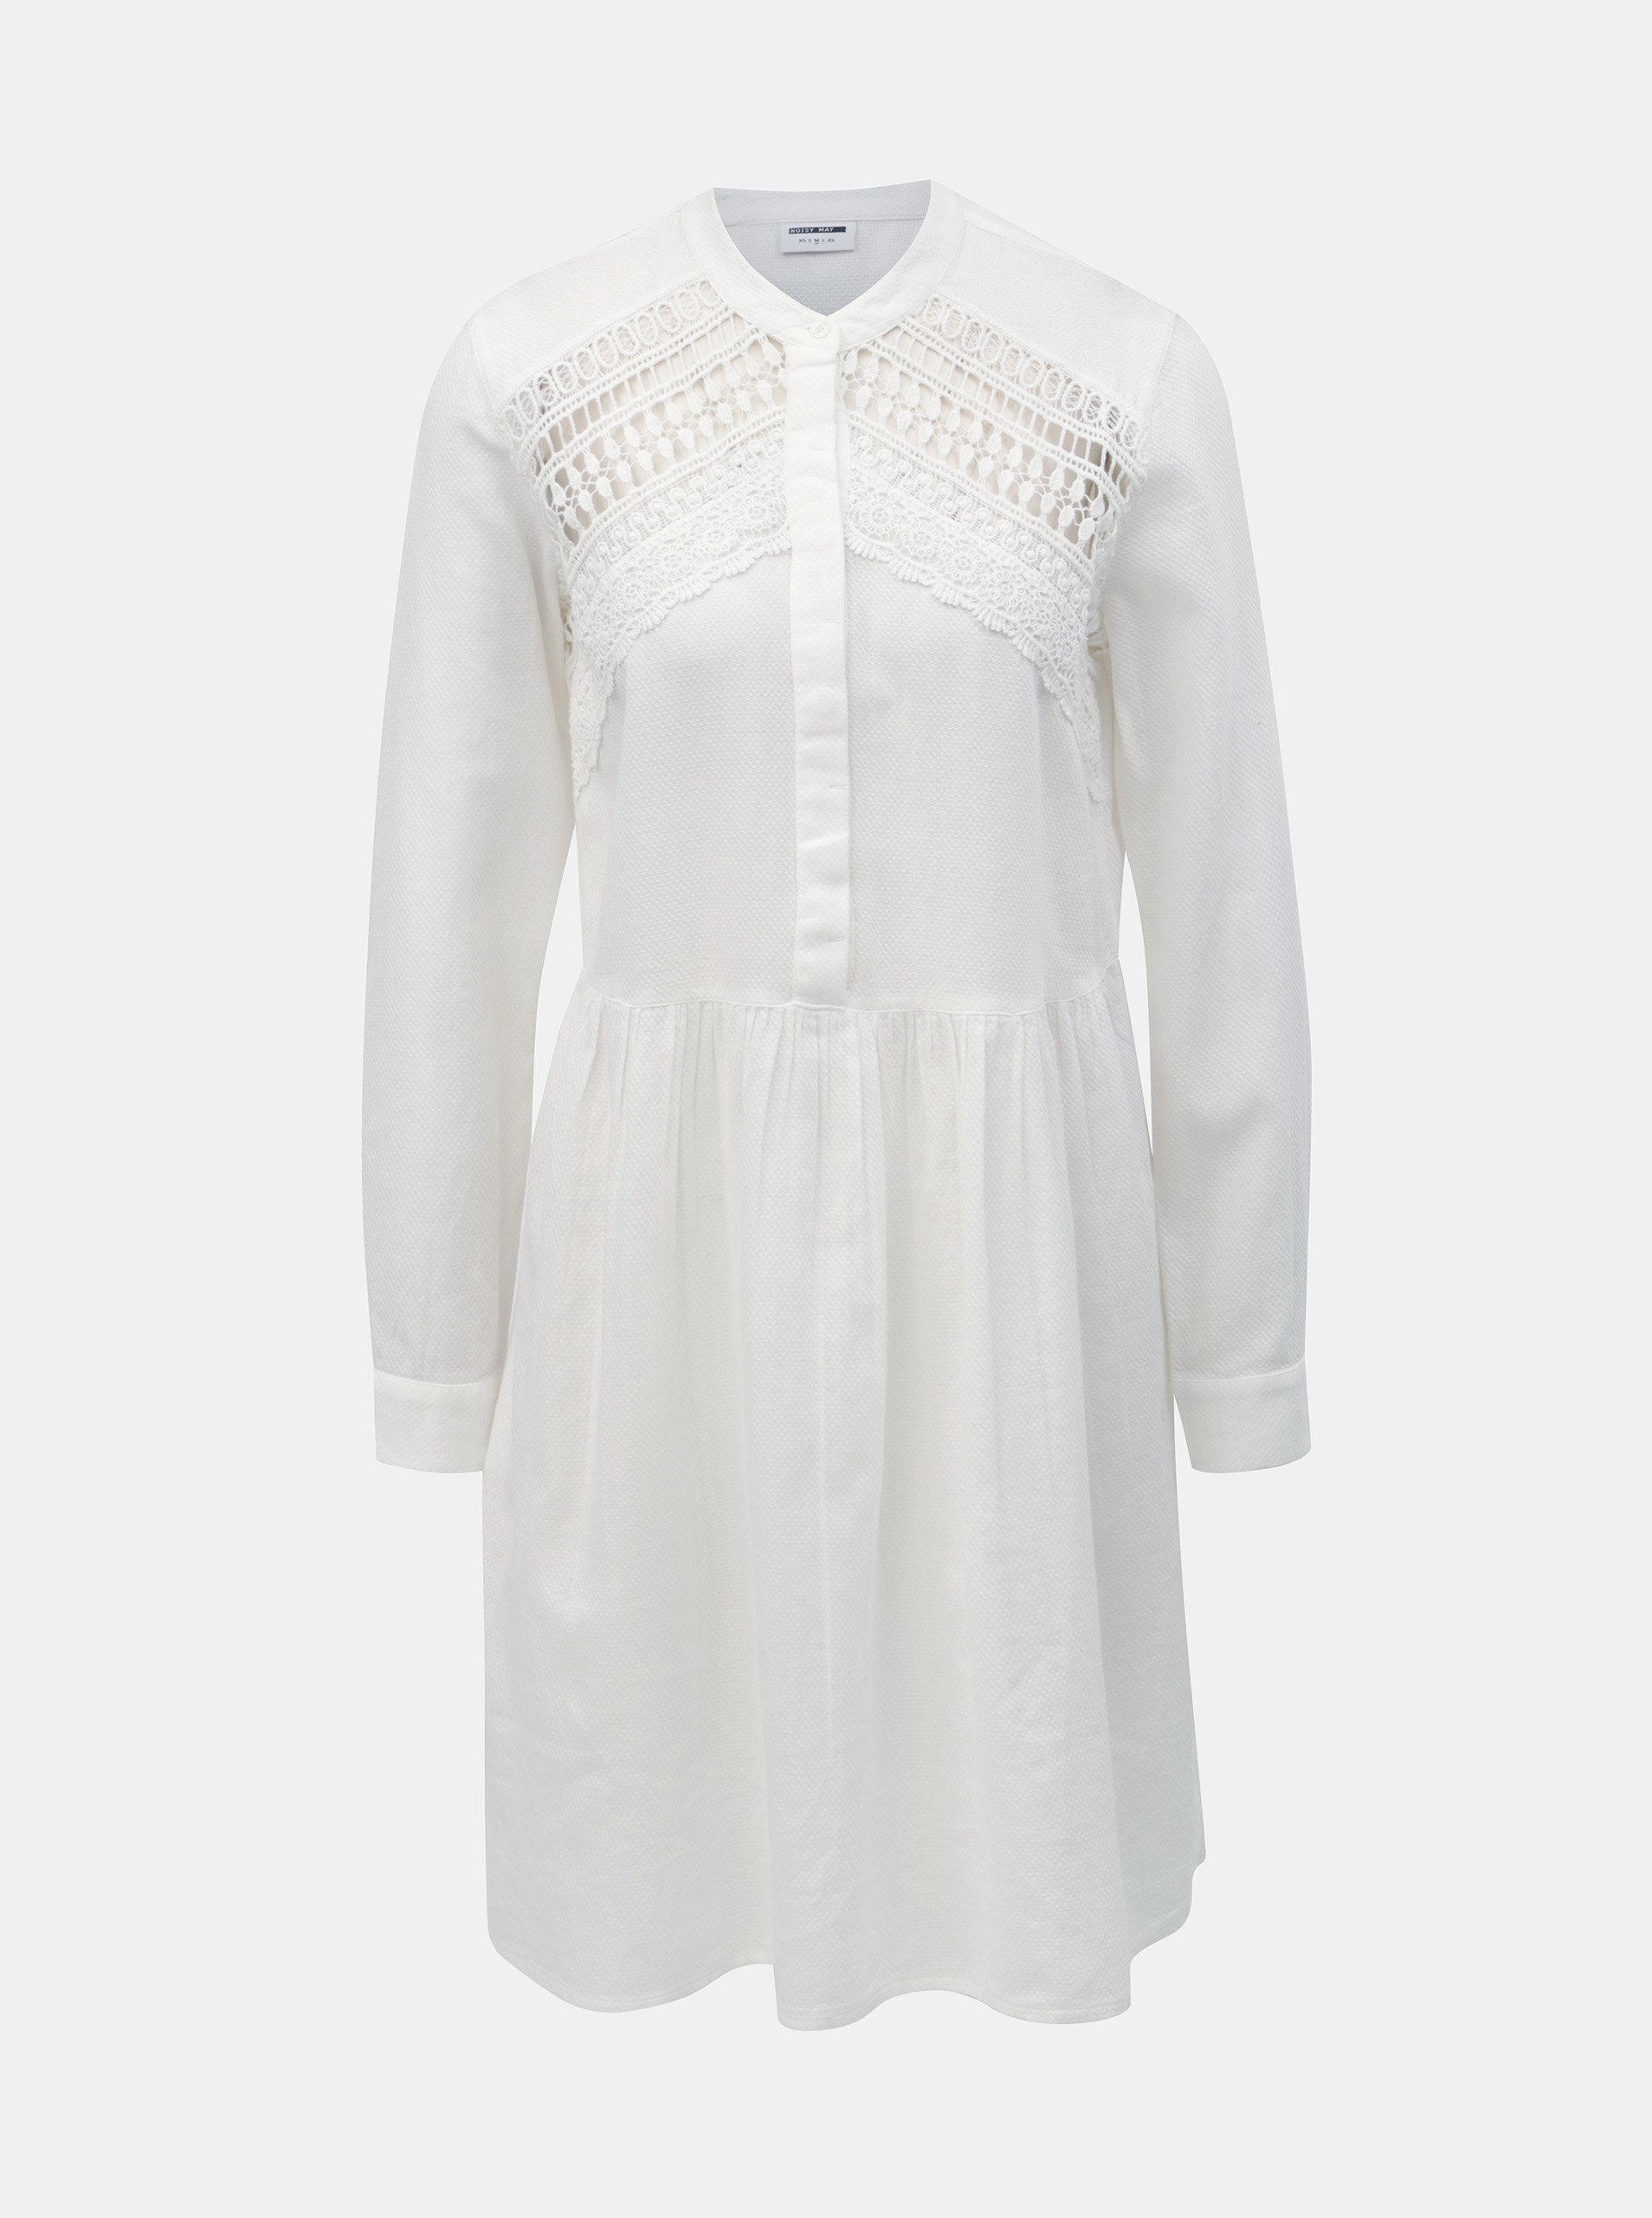 0e0f251aae7b Biele šaty s čipkou Noisy May Arge ...